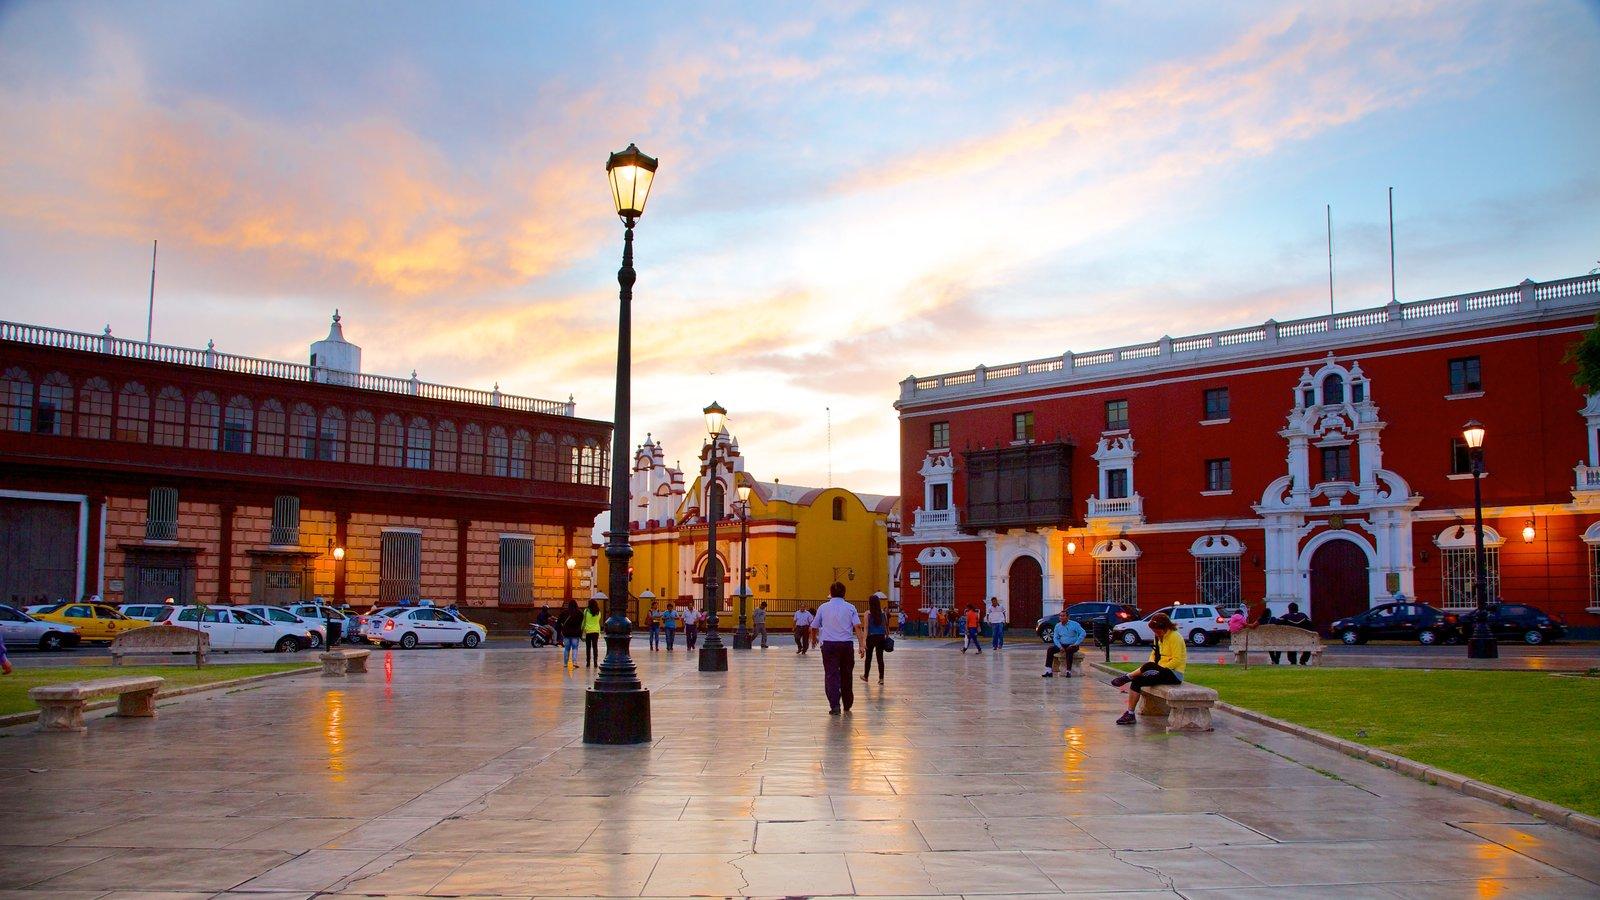 Trujillo Plaza de Armas featuring street scenes, a square or plaza and a city